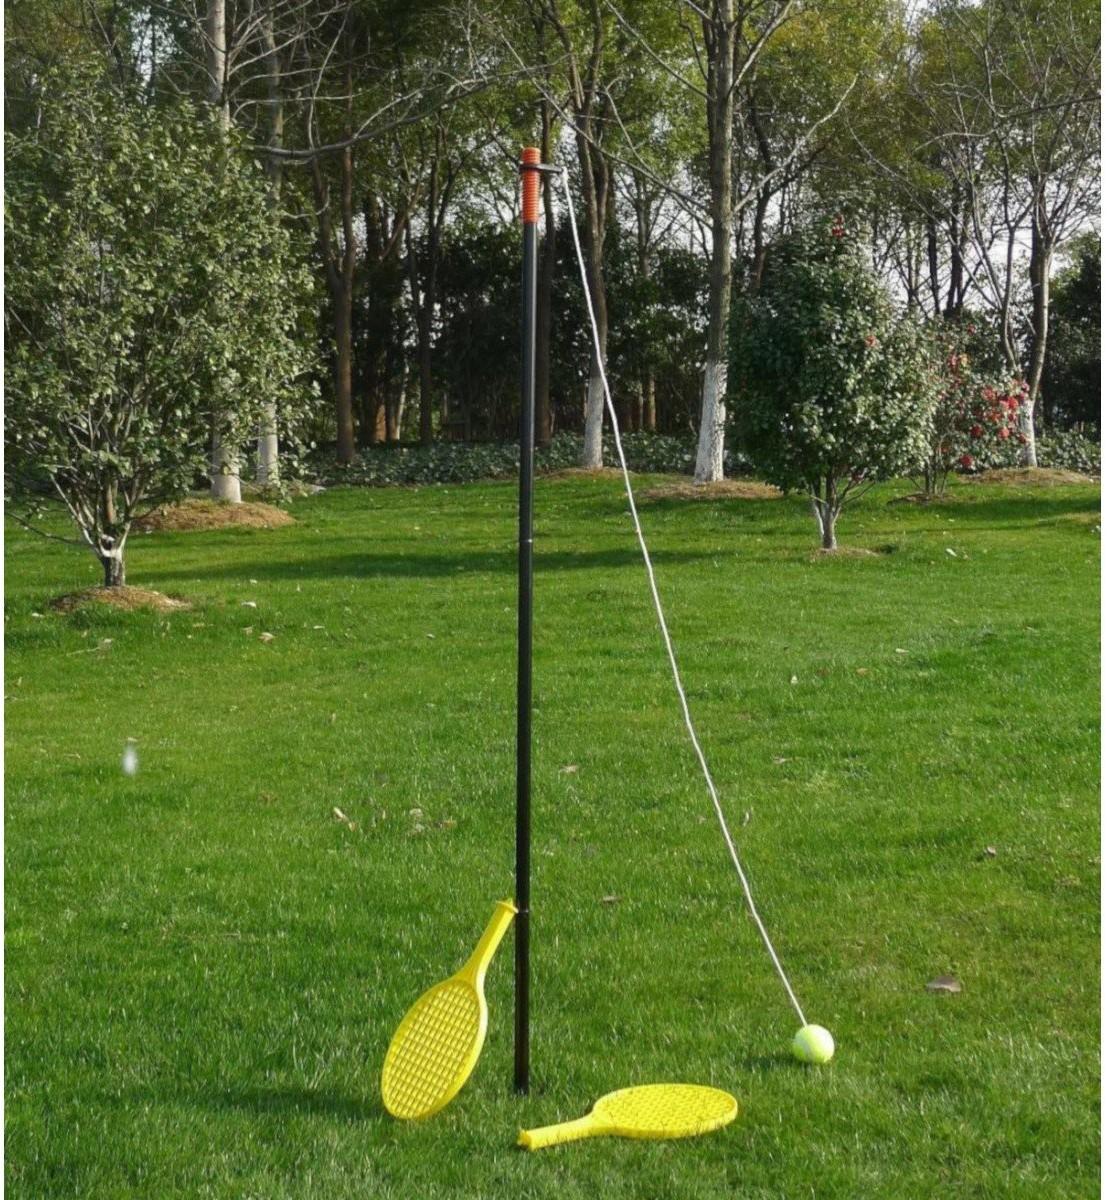 Enero Enero, Zestaw tenis ziemny Swingball